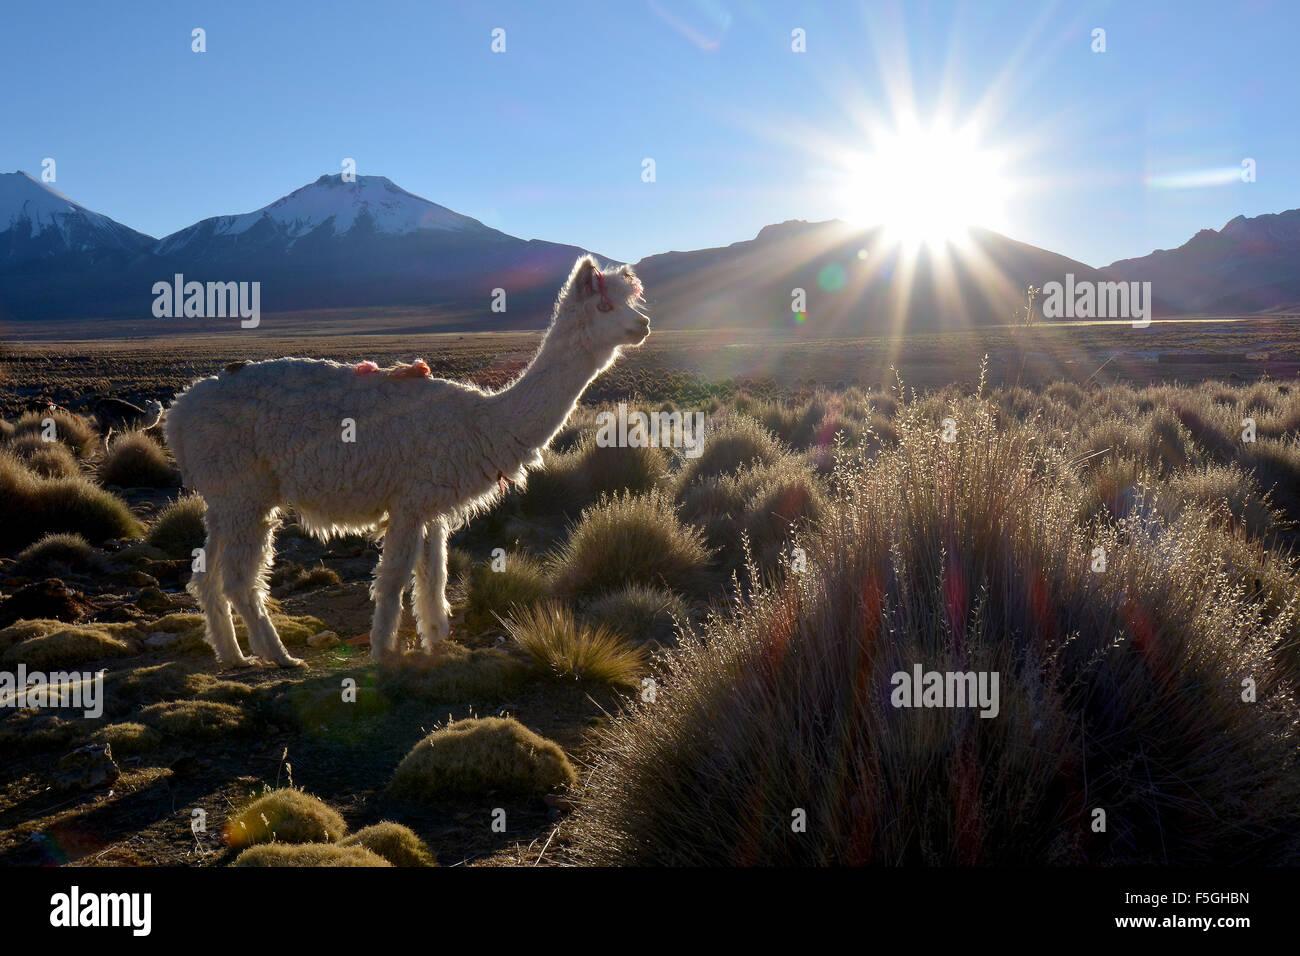 Llama (lama glama) auf der Weide, Hintergrundbeleuchtung, Altiplano, Sajama Nationalpark, Bolivien Stockbild